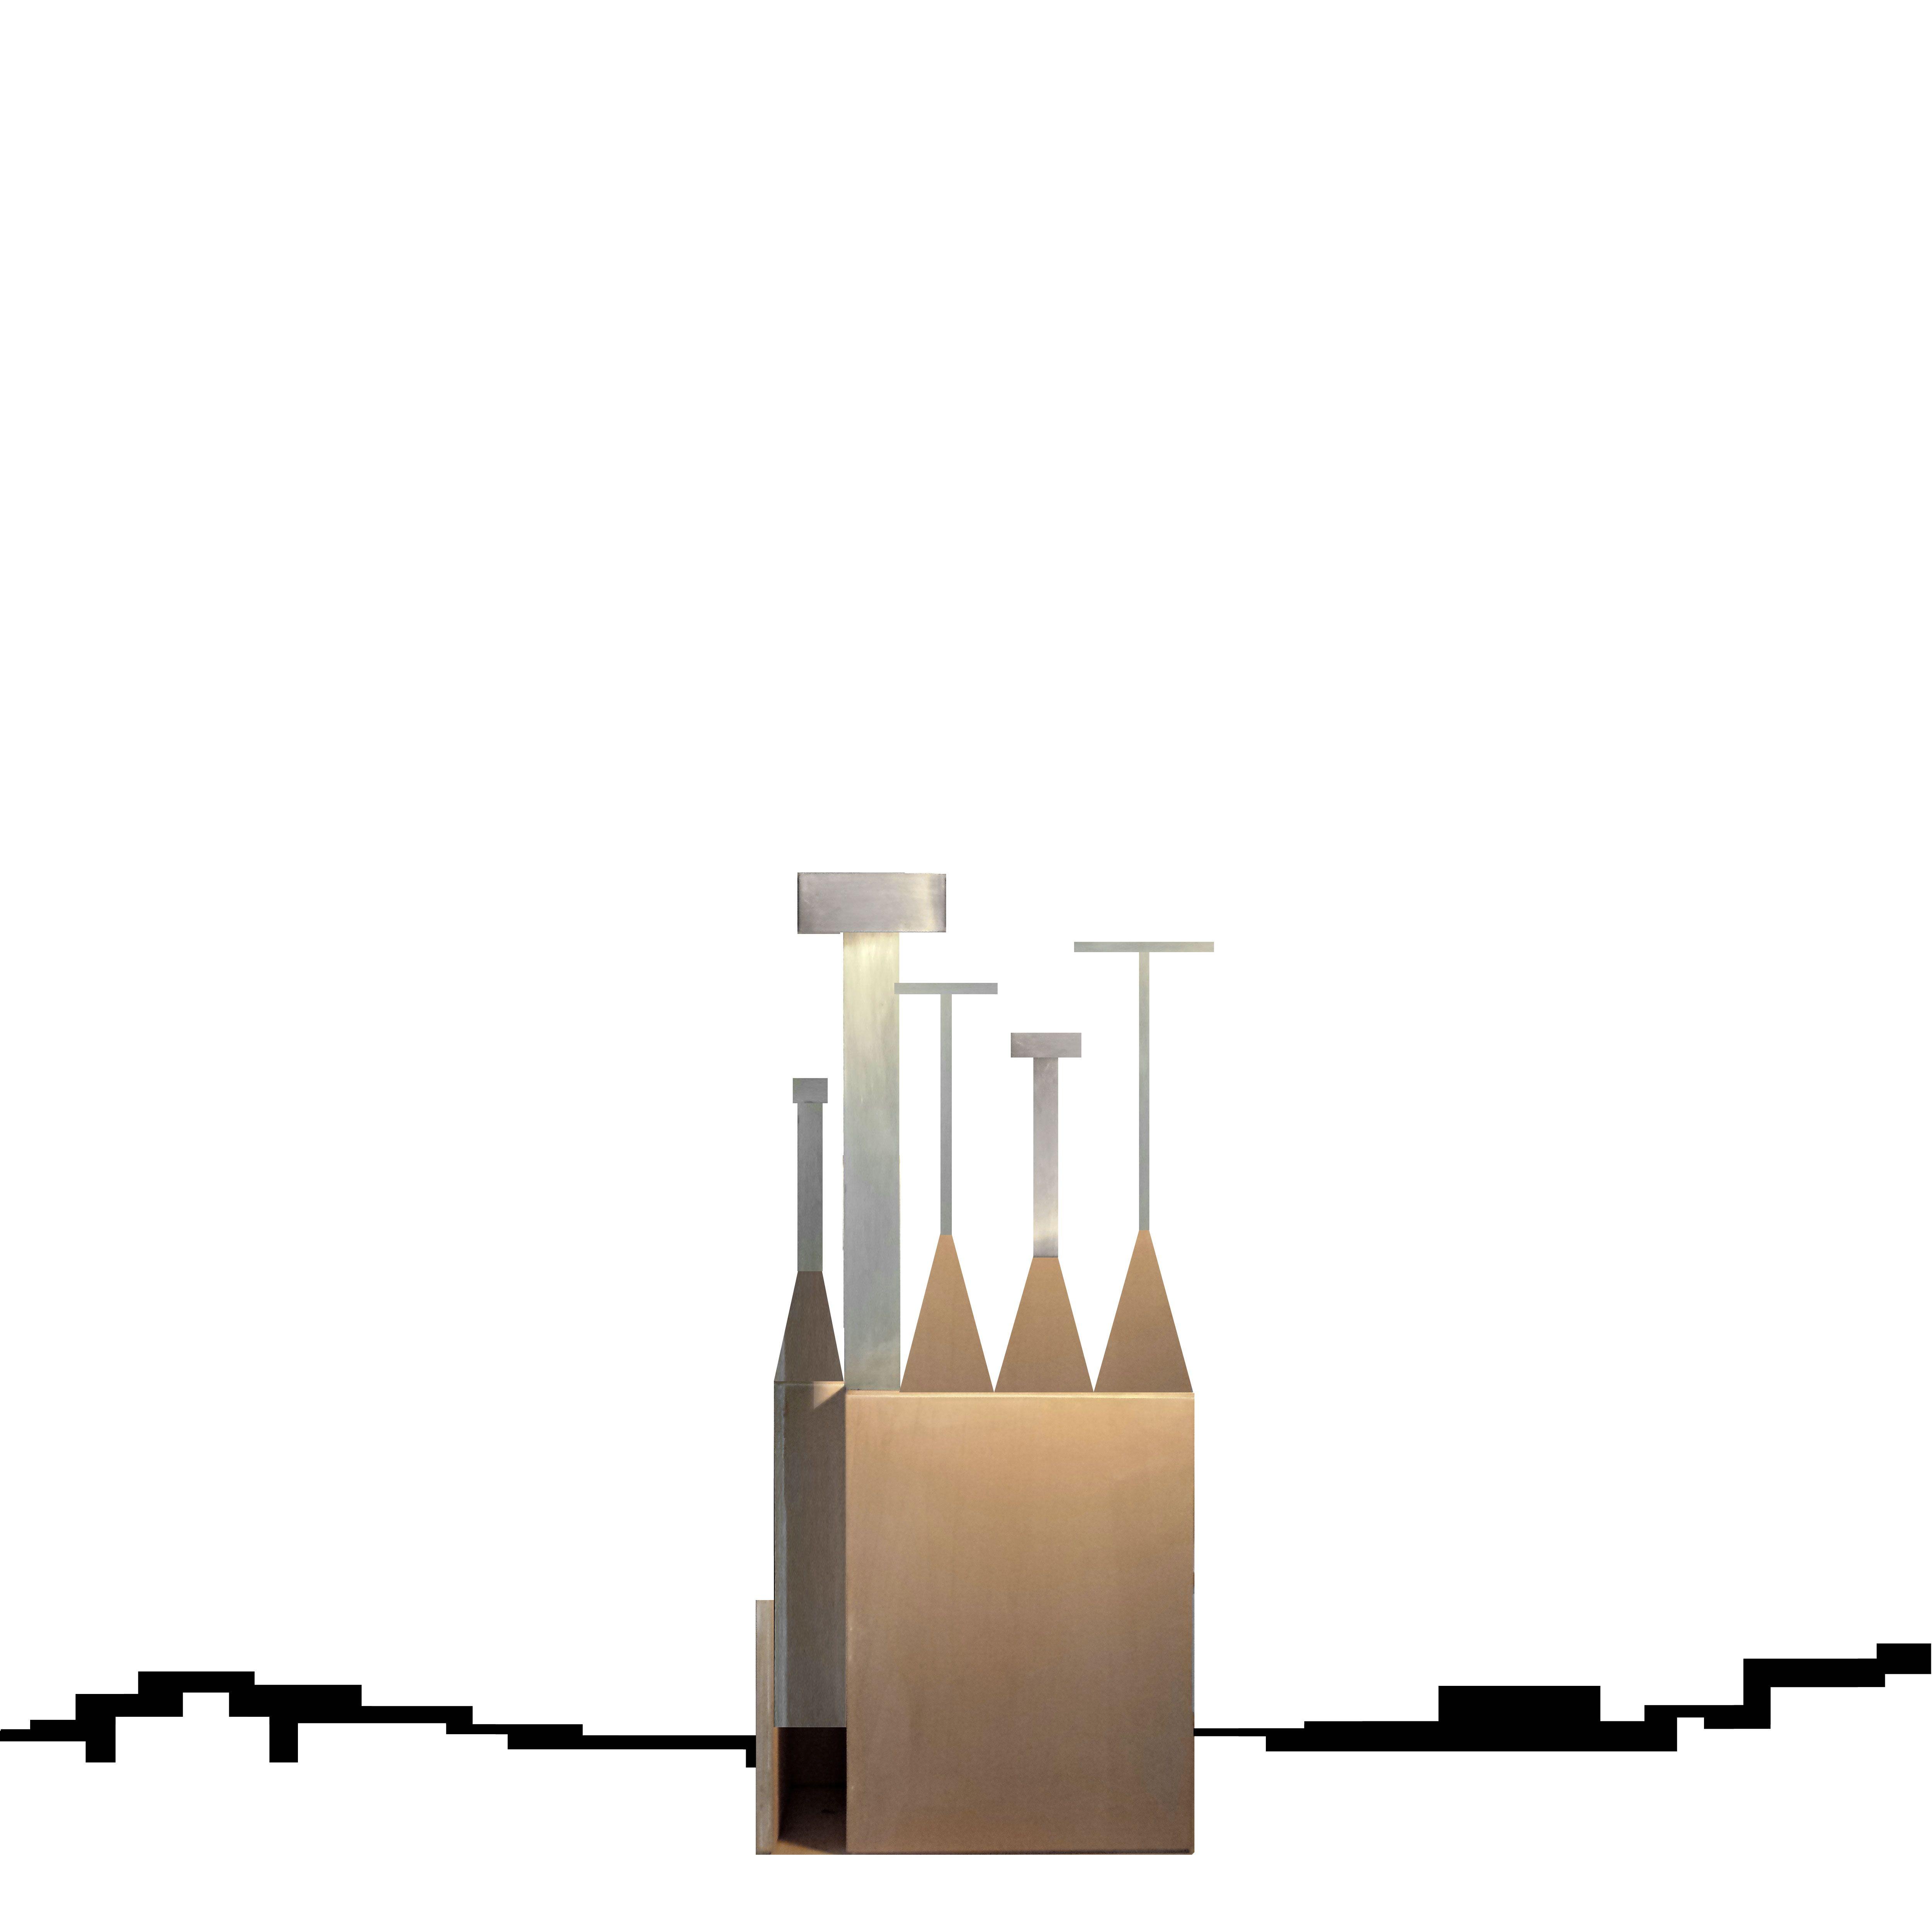 Beniamino Servino. Piccola chiesa con 5 croci/Lovely church with 5 silver crosses. LA FORMA FINITA È PROVVISORIA. THE FINISHED/COMPLETED FORM/SHAPE IS TEMPORARY.